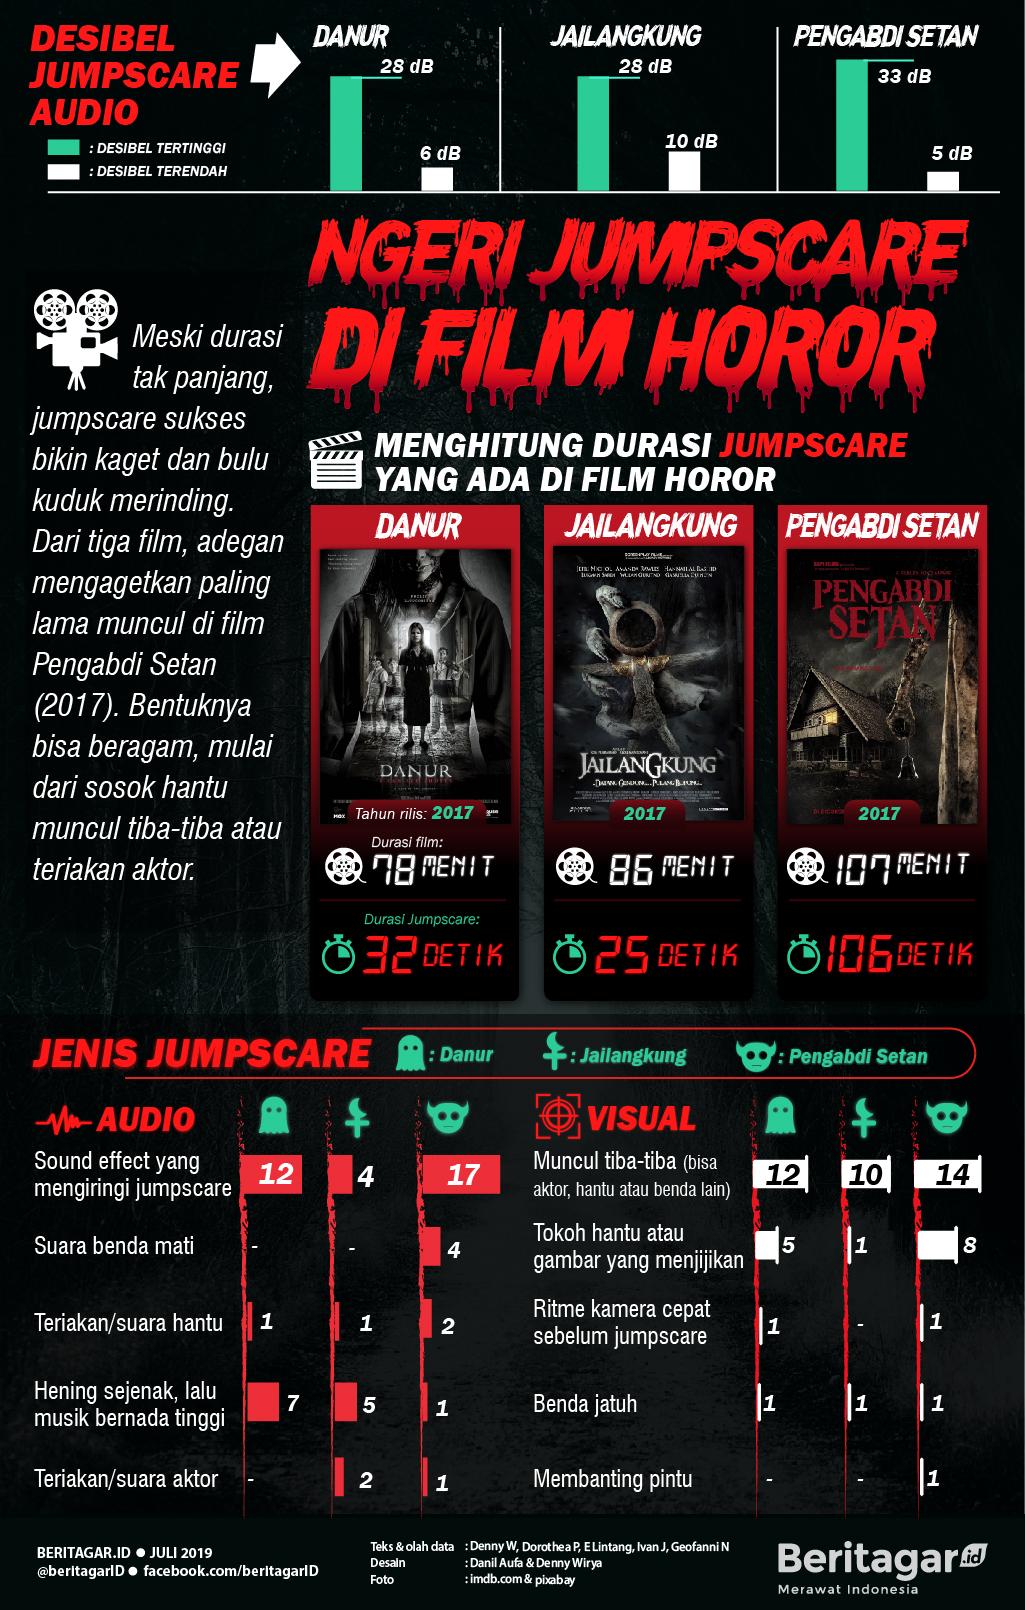 Infografis Ngeri Jumpscare di Film Horor